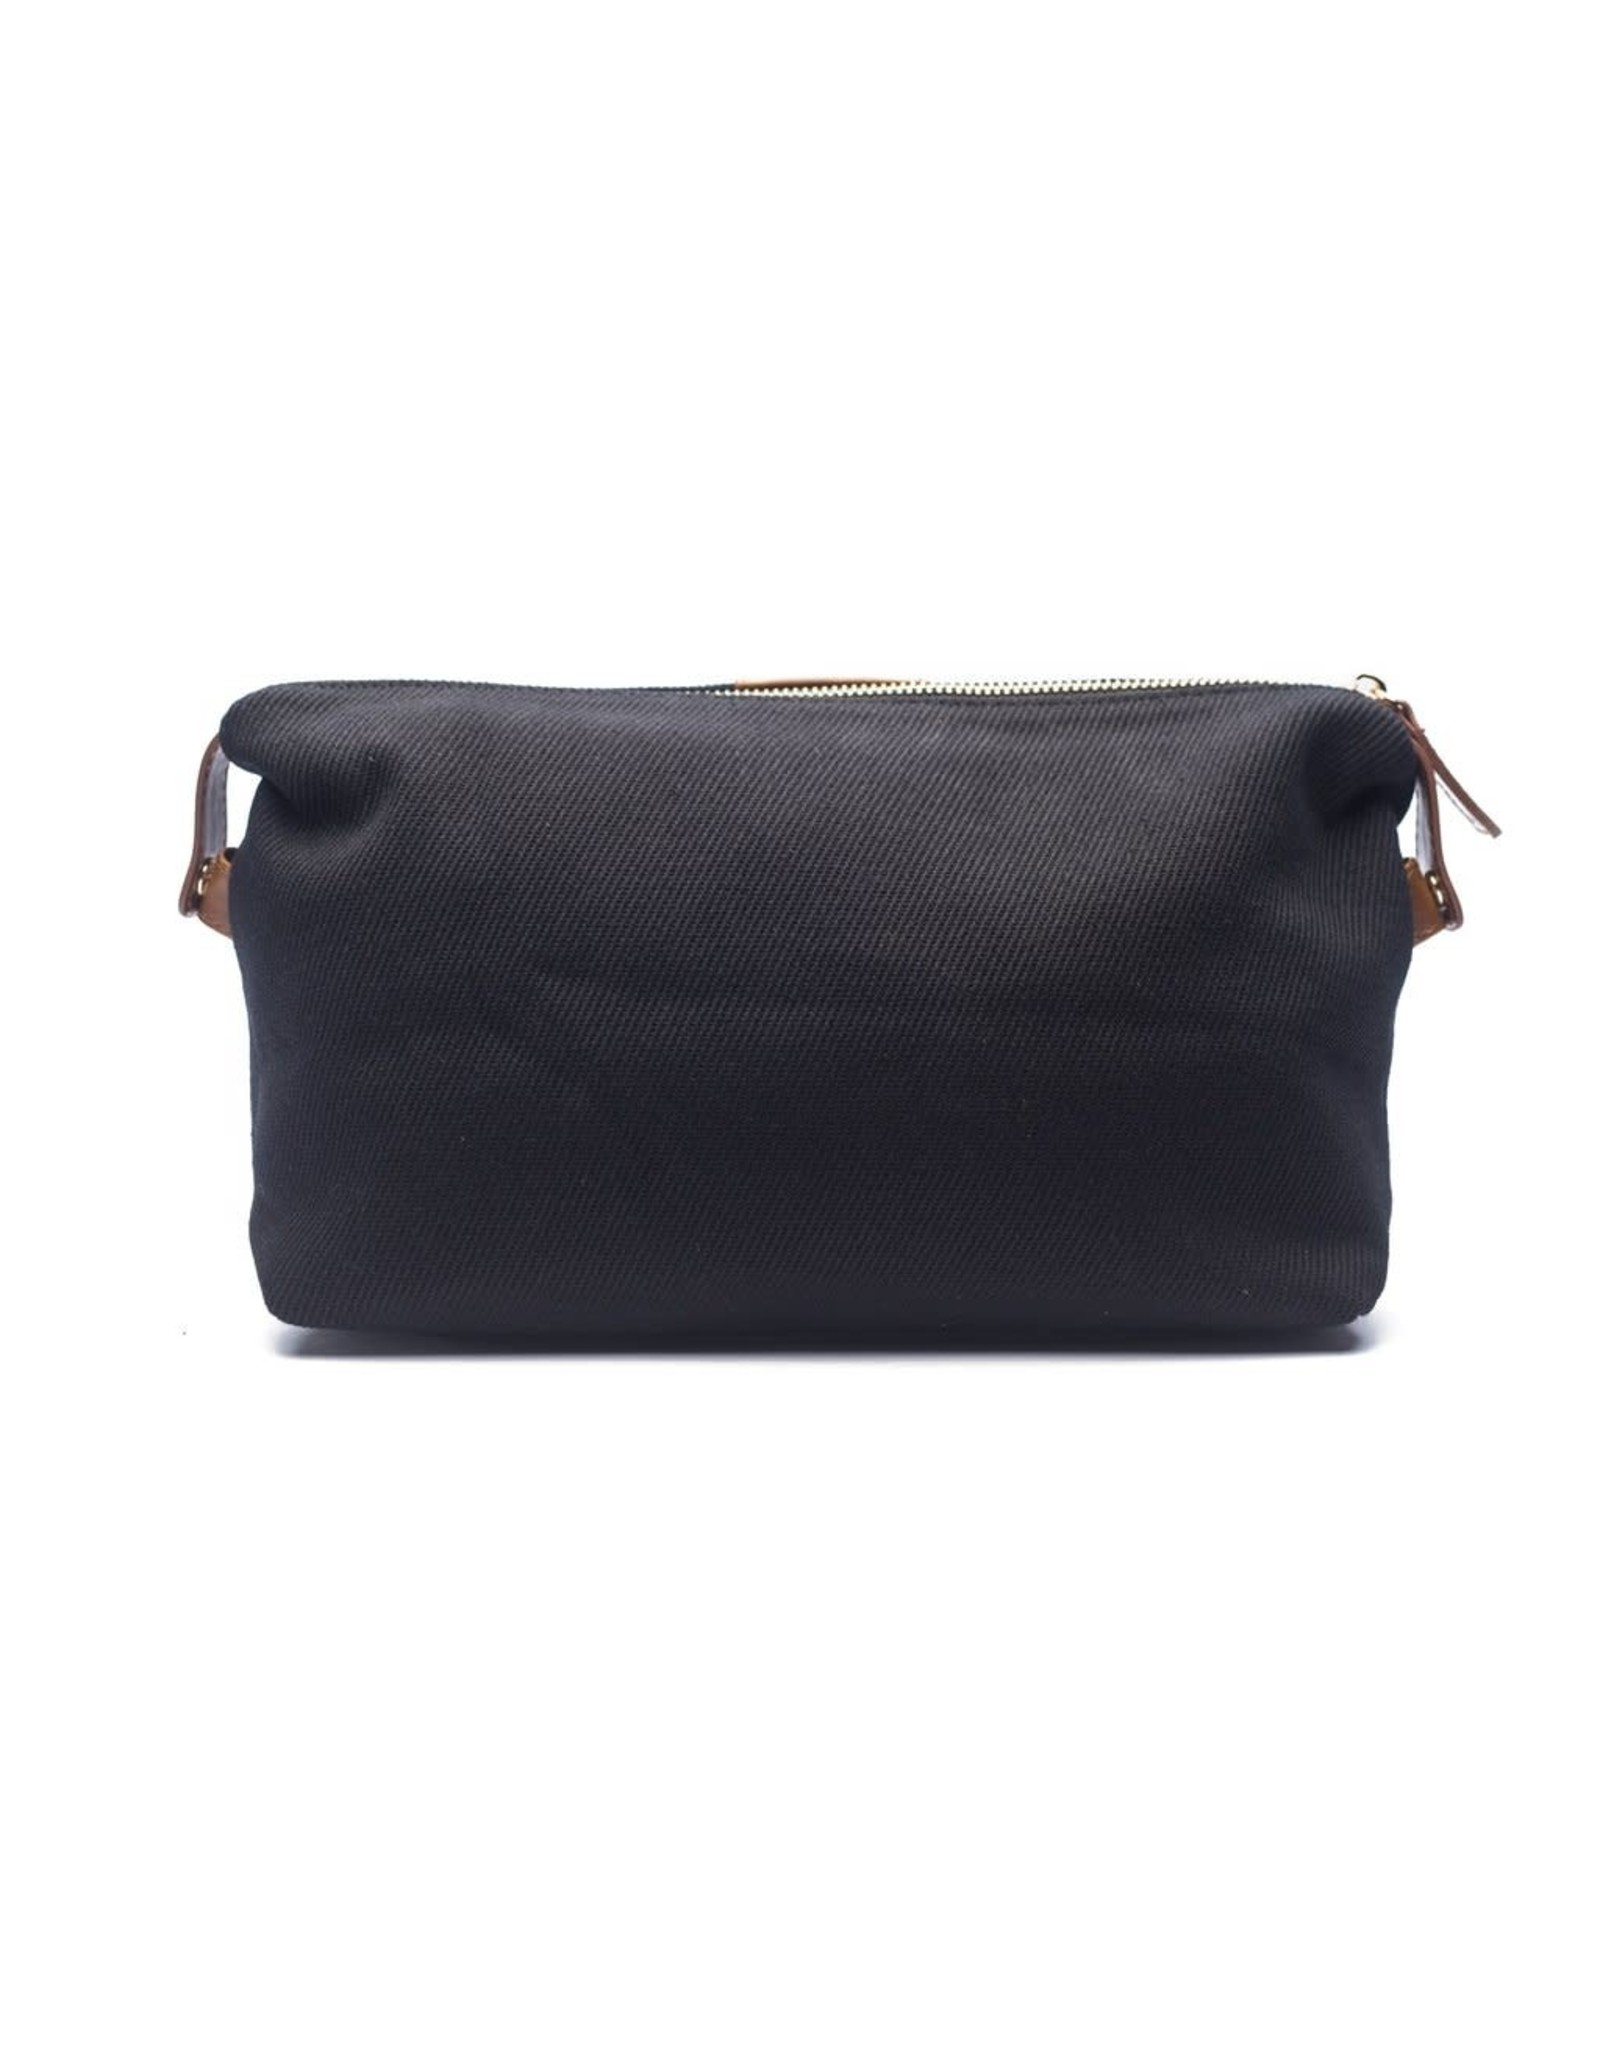 Brouk & Co Original Toiletry Bag Black